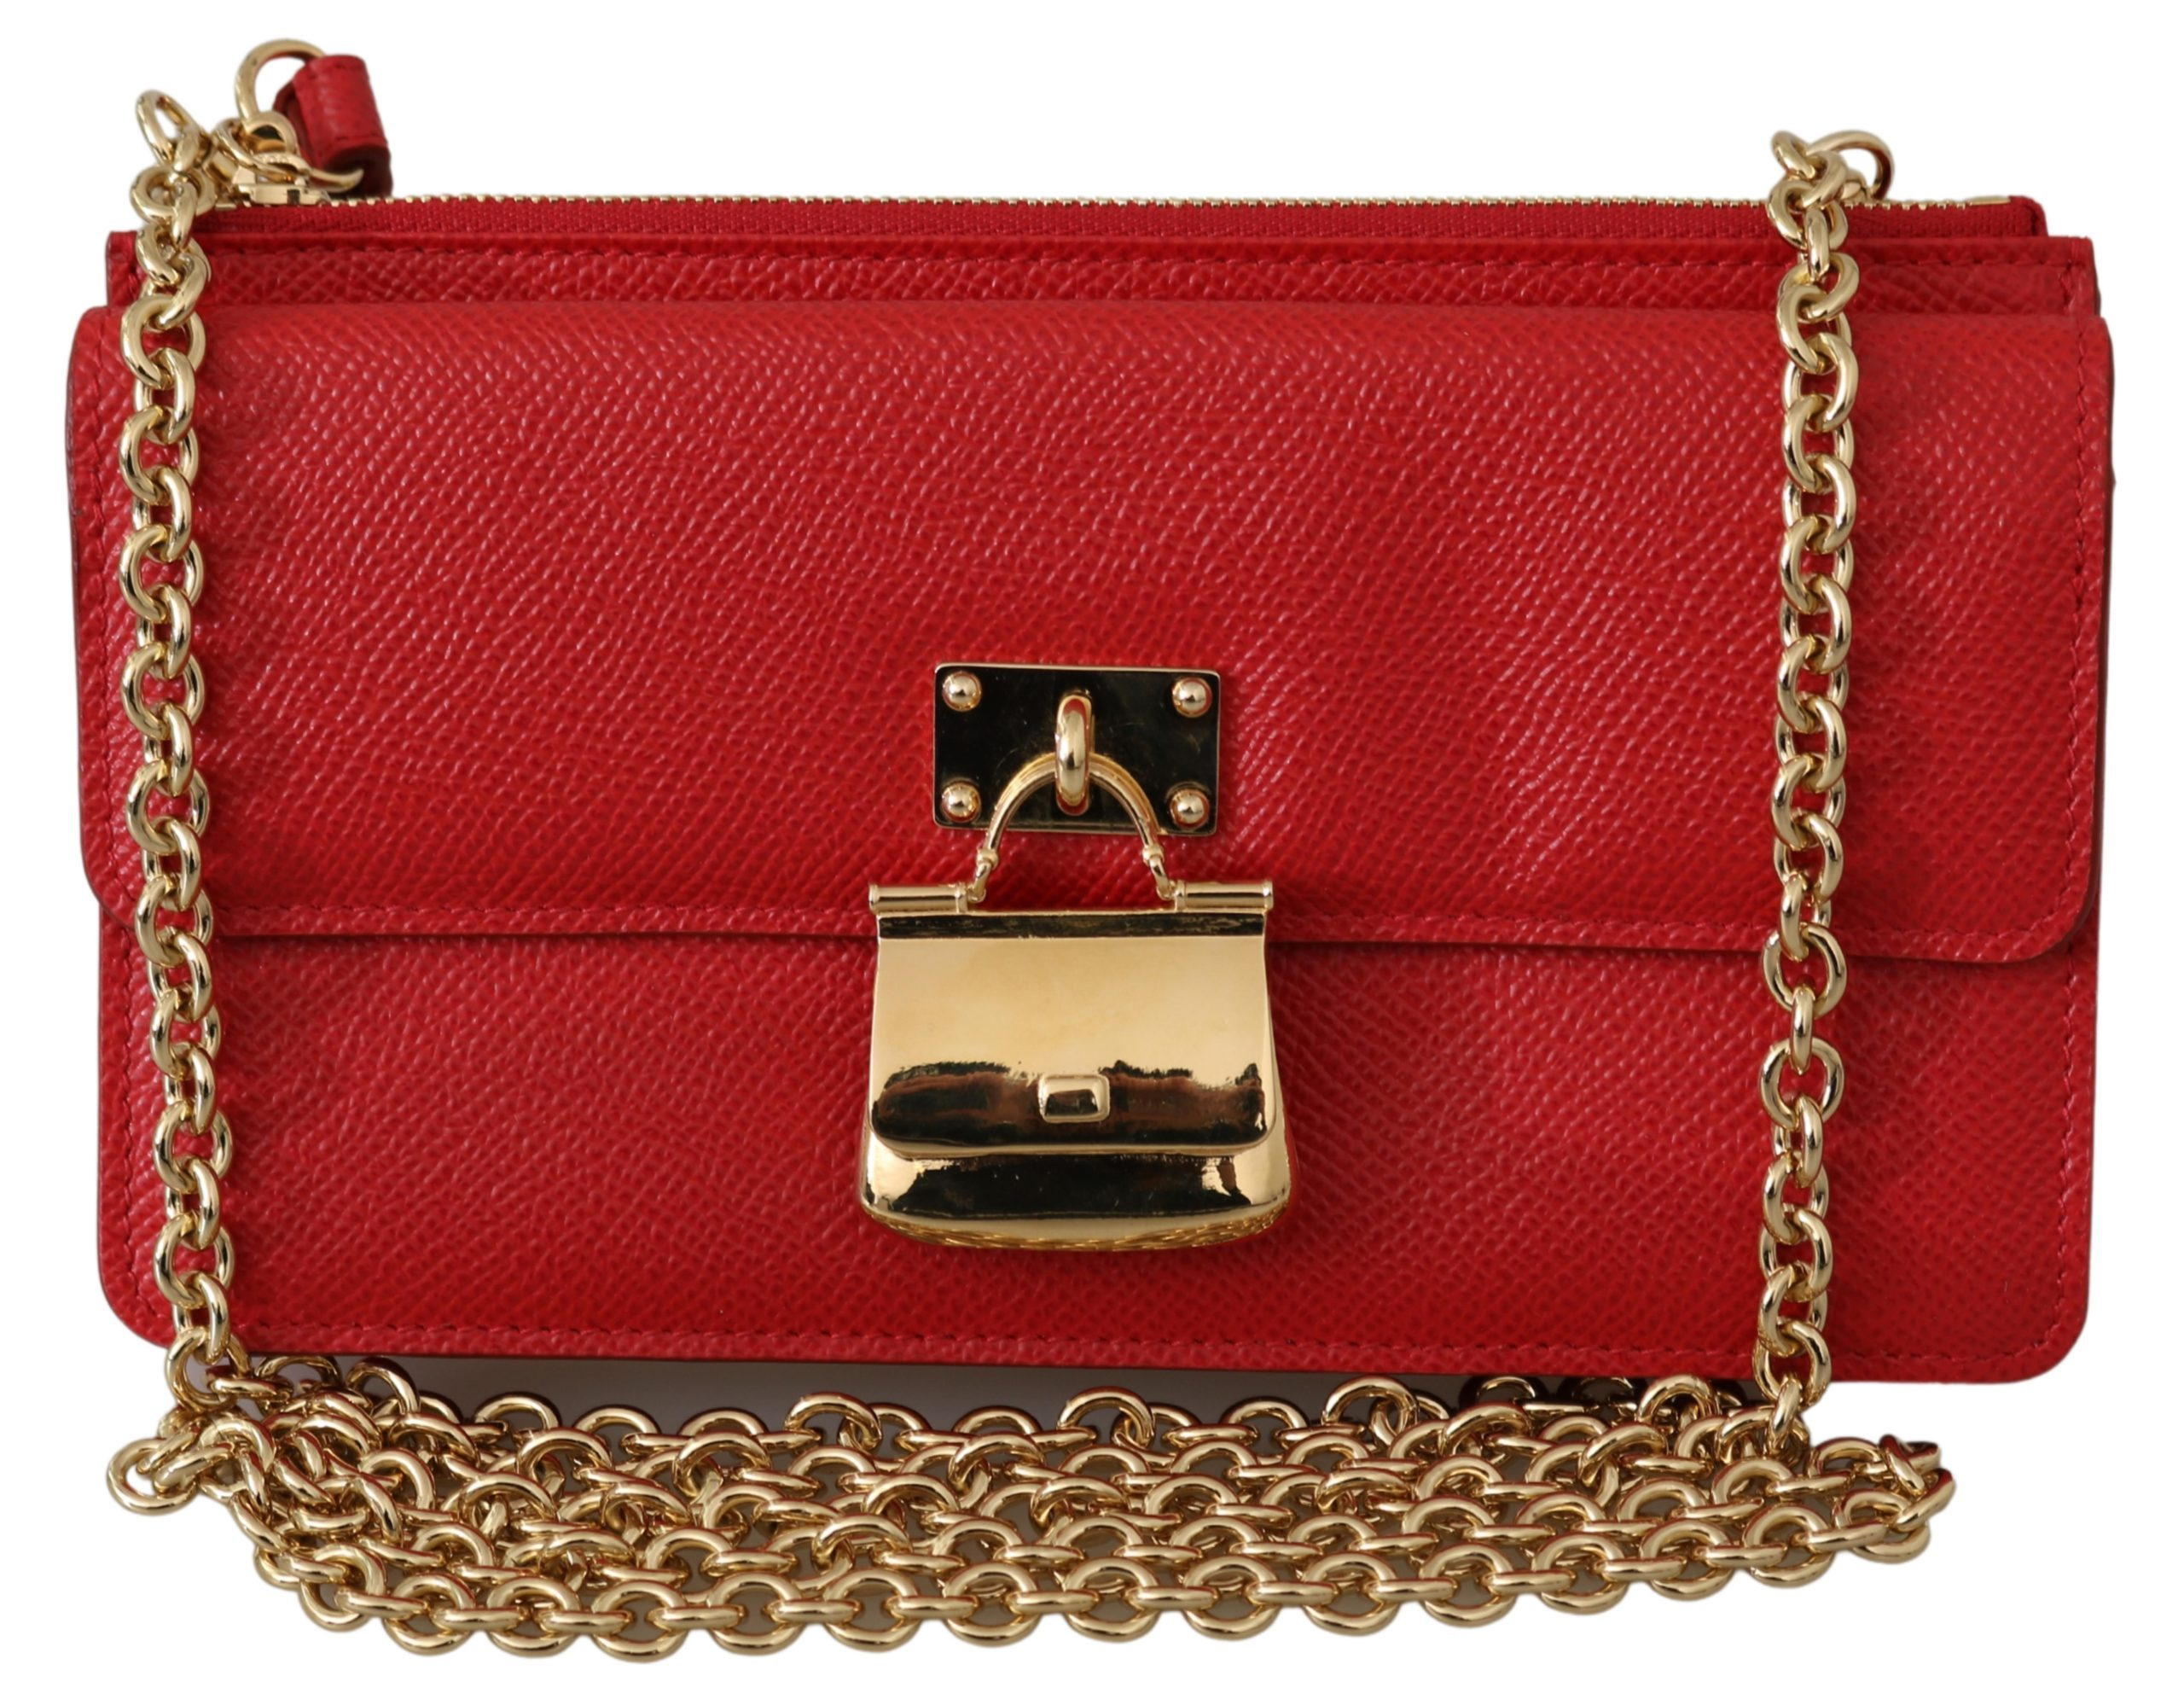 Dolce & Gabbana Women's Chain Leather Shoulder Bag Gold VAS9536